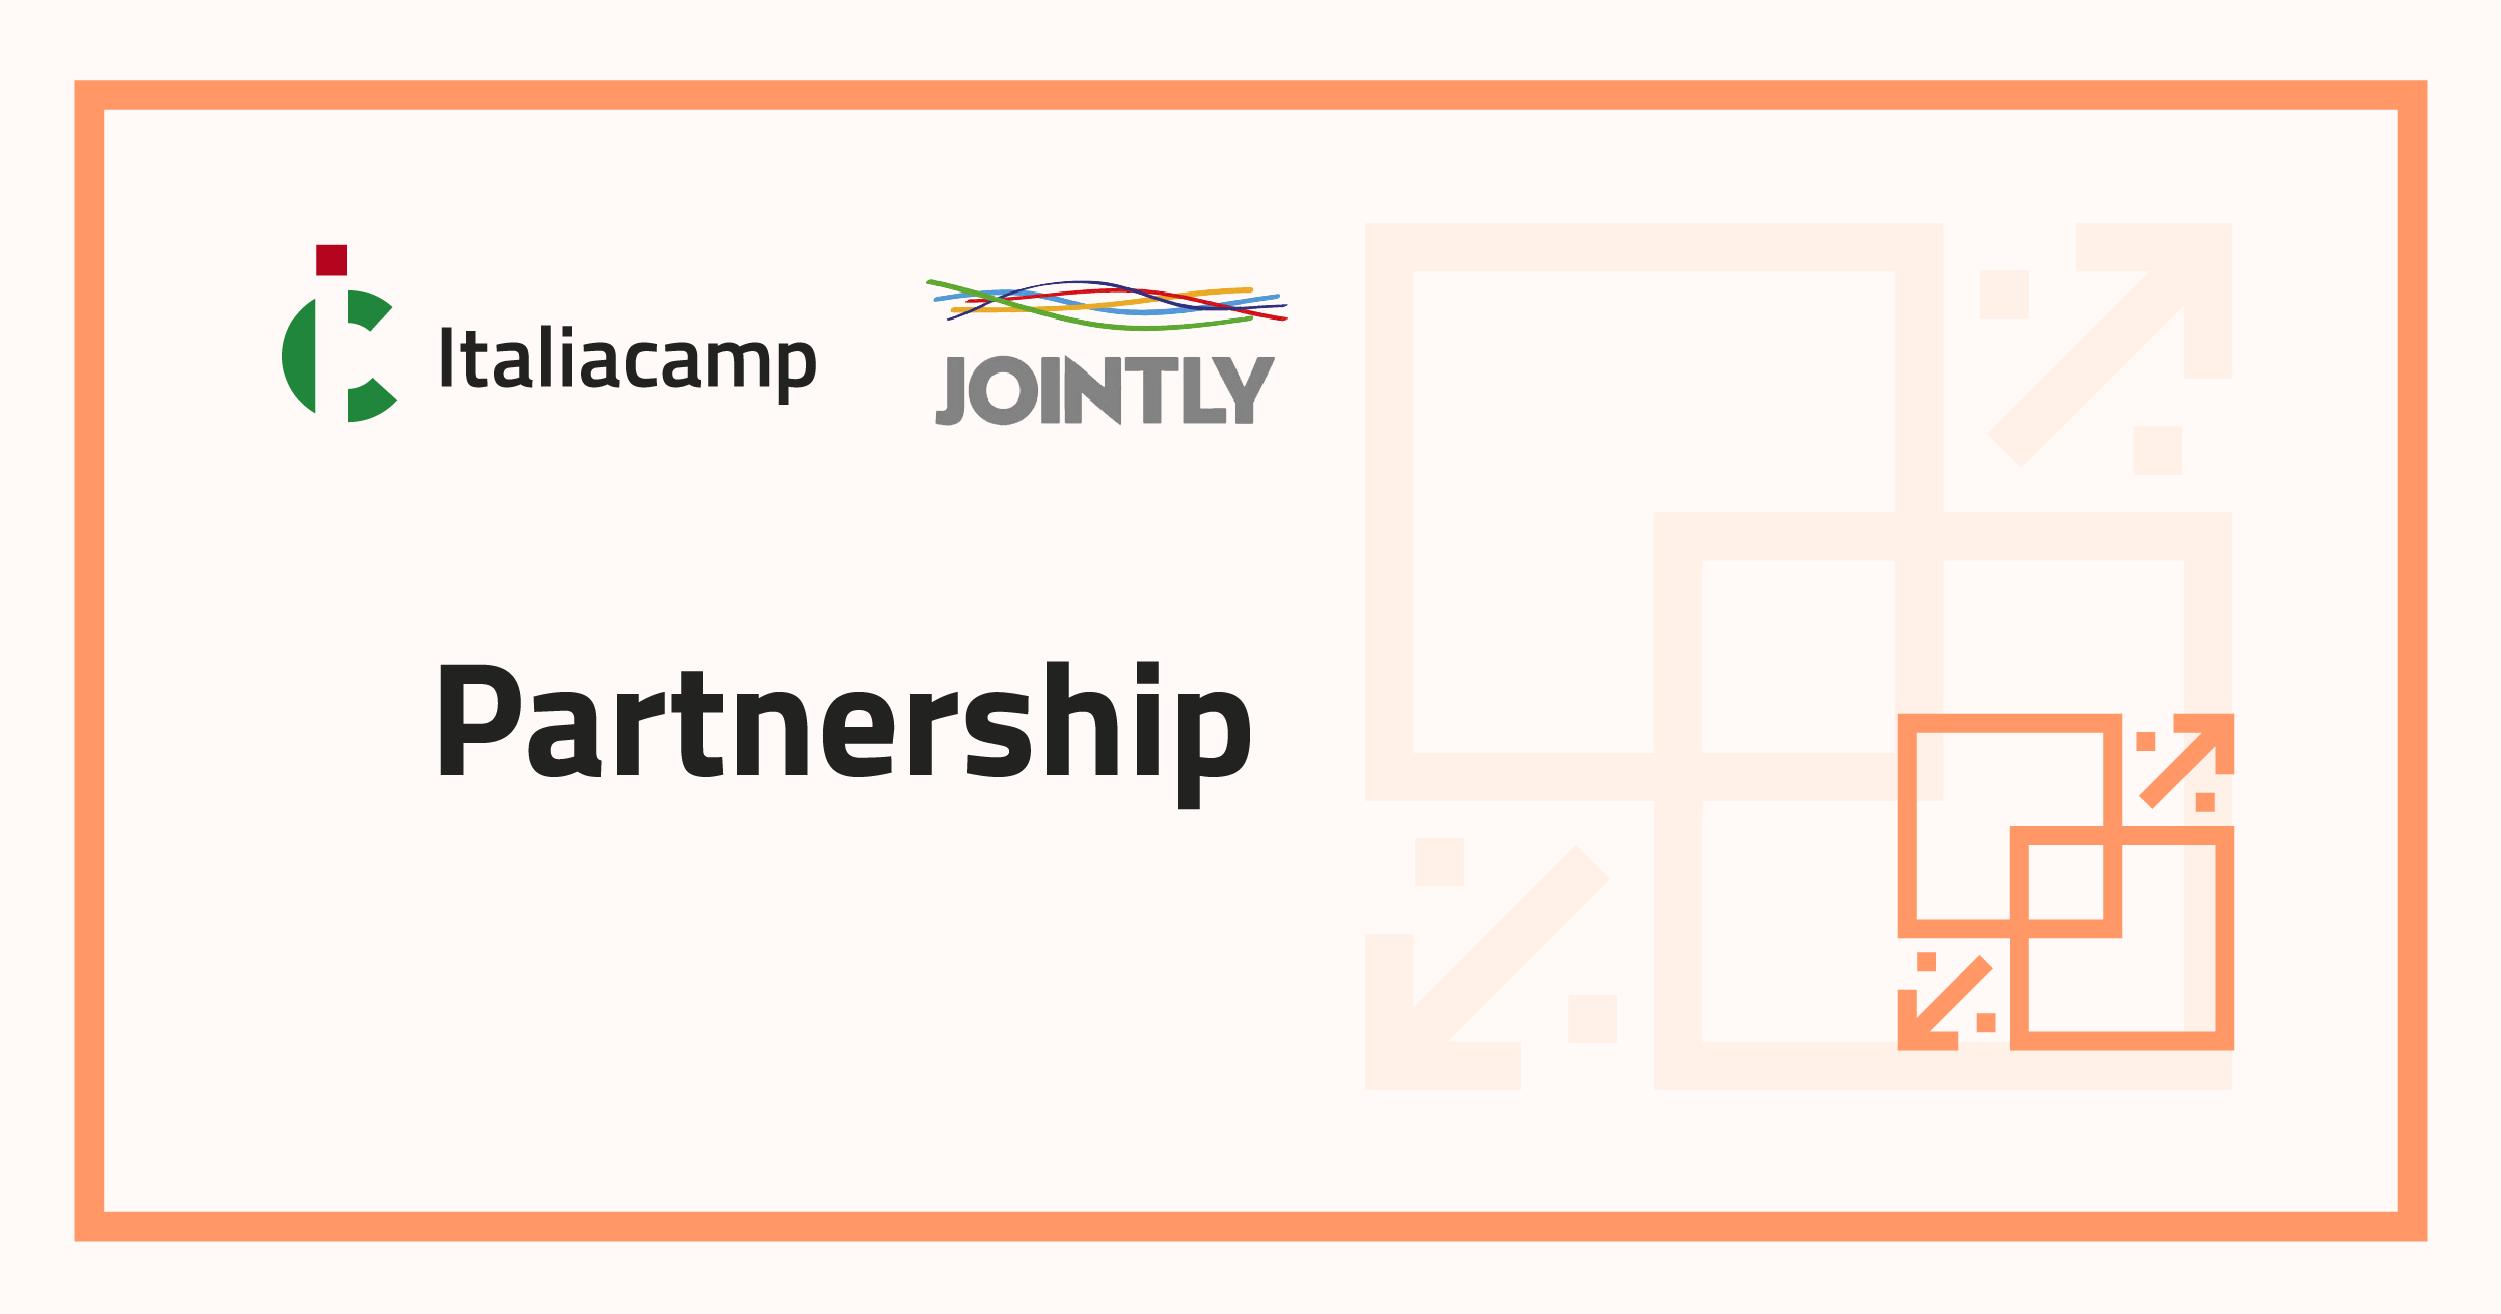 Partnership Italiacamp Jointly